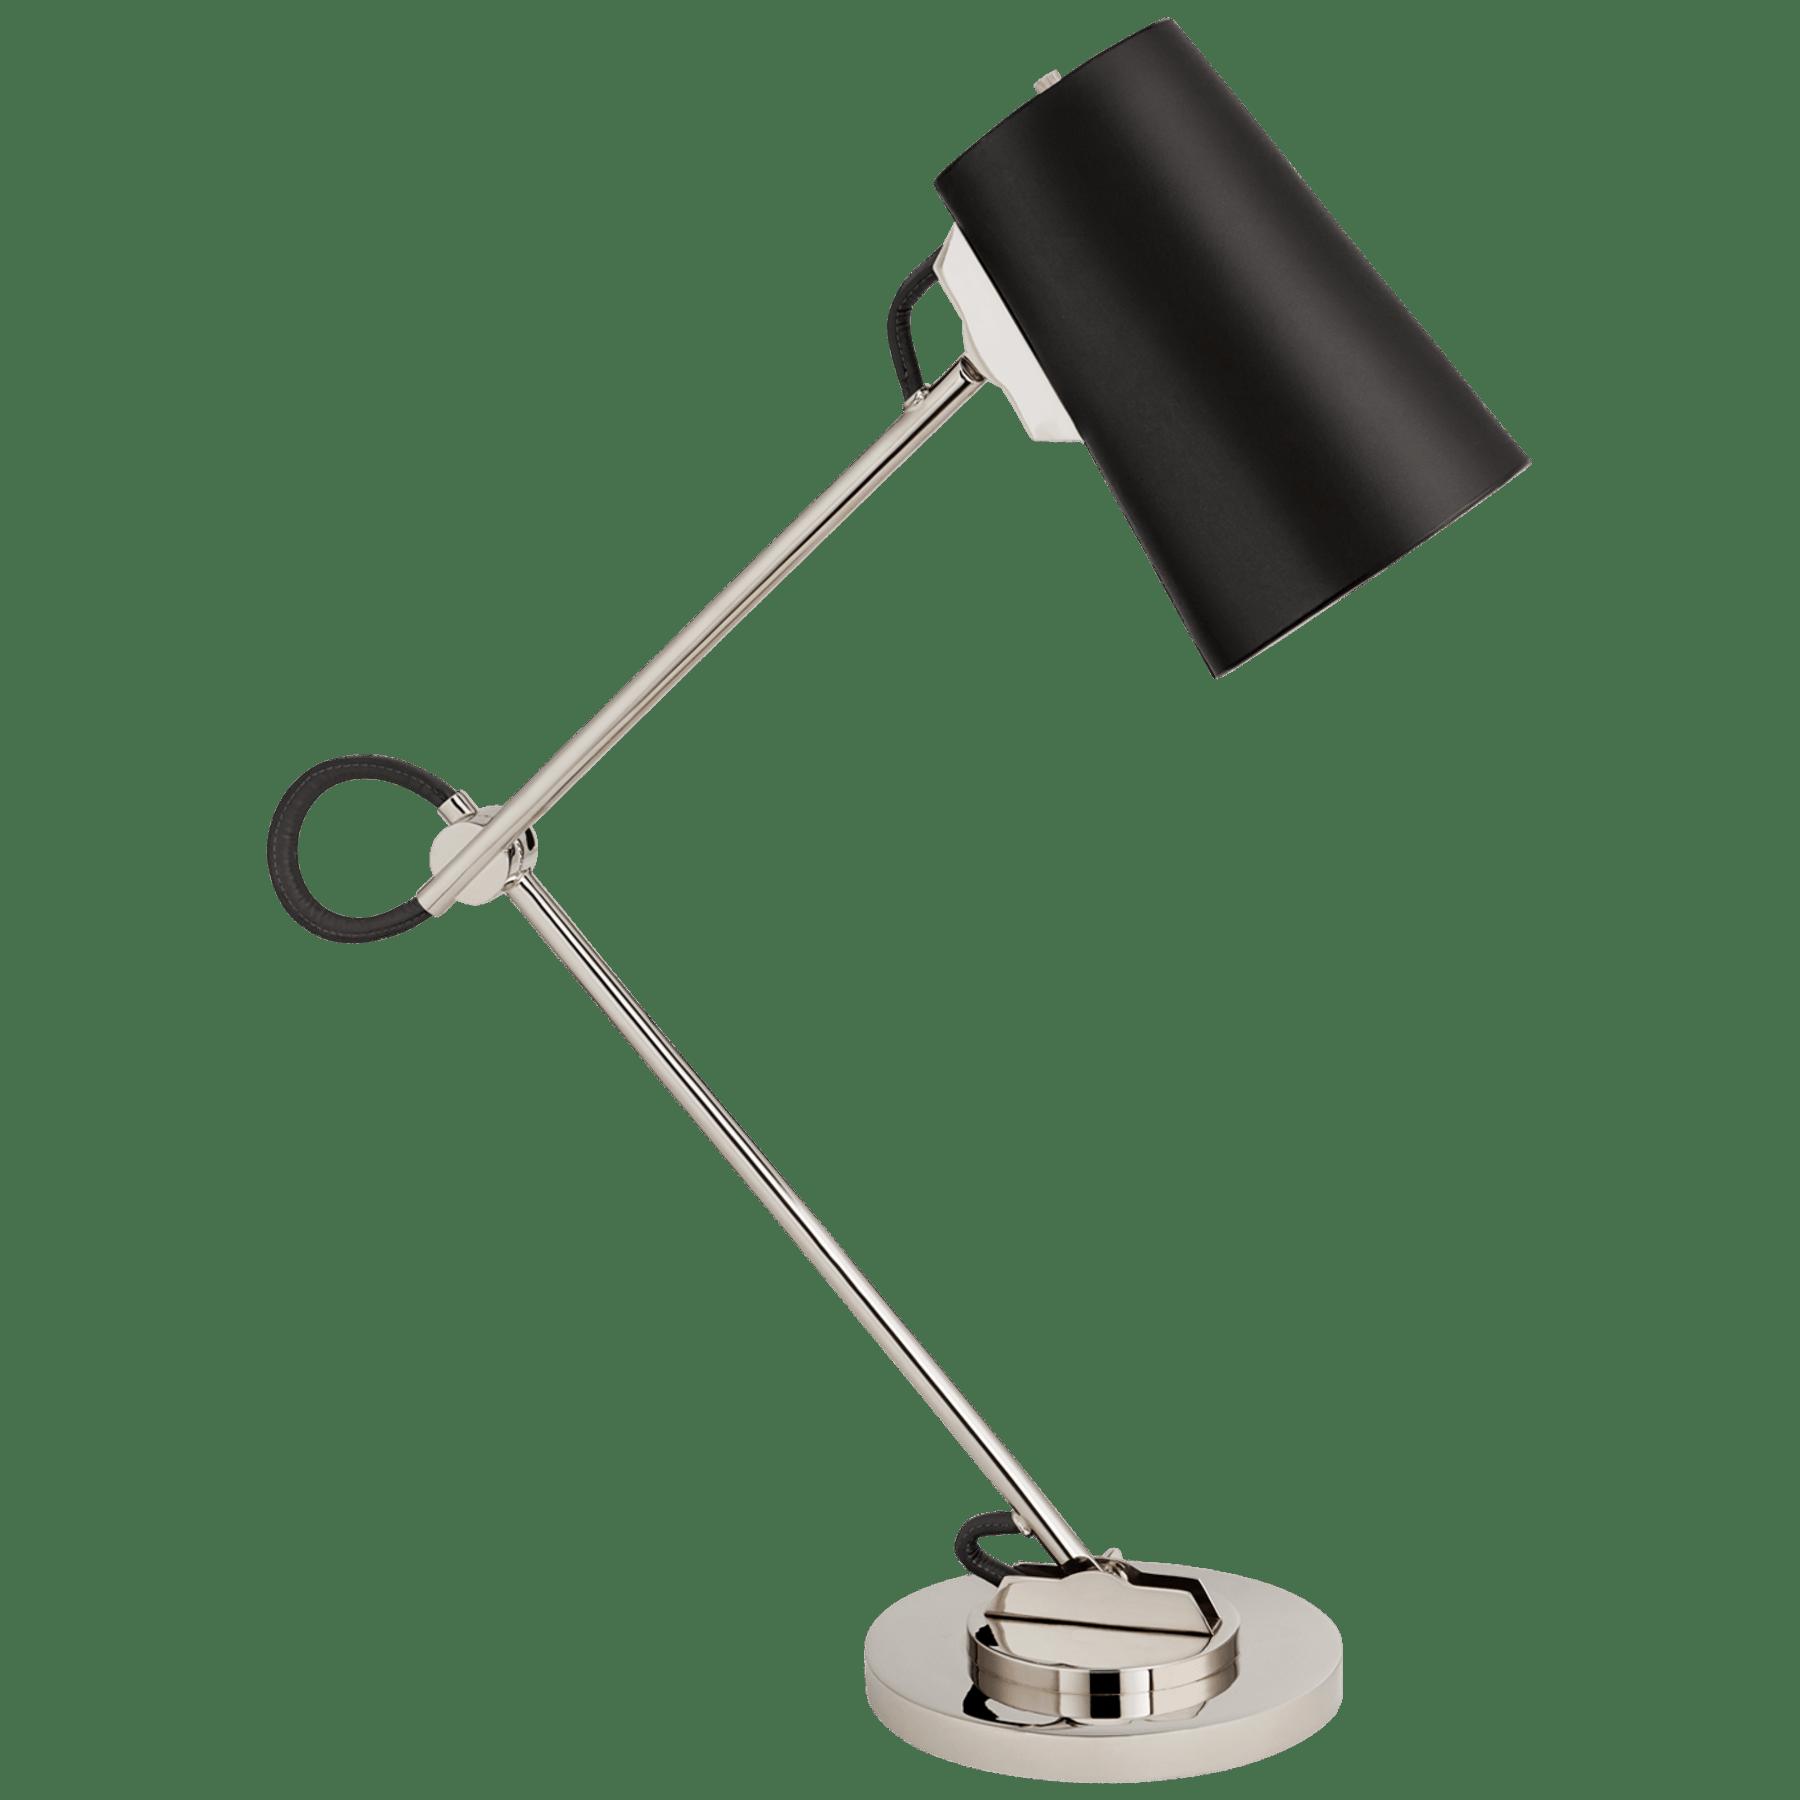 Benton Adjustable Desk Lamp In 2020 Desk Lamp Adjustable Desk Lamps Lamp